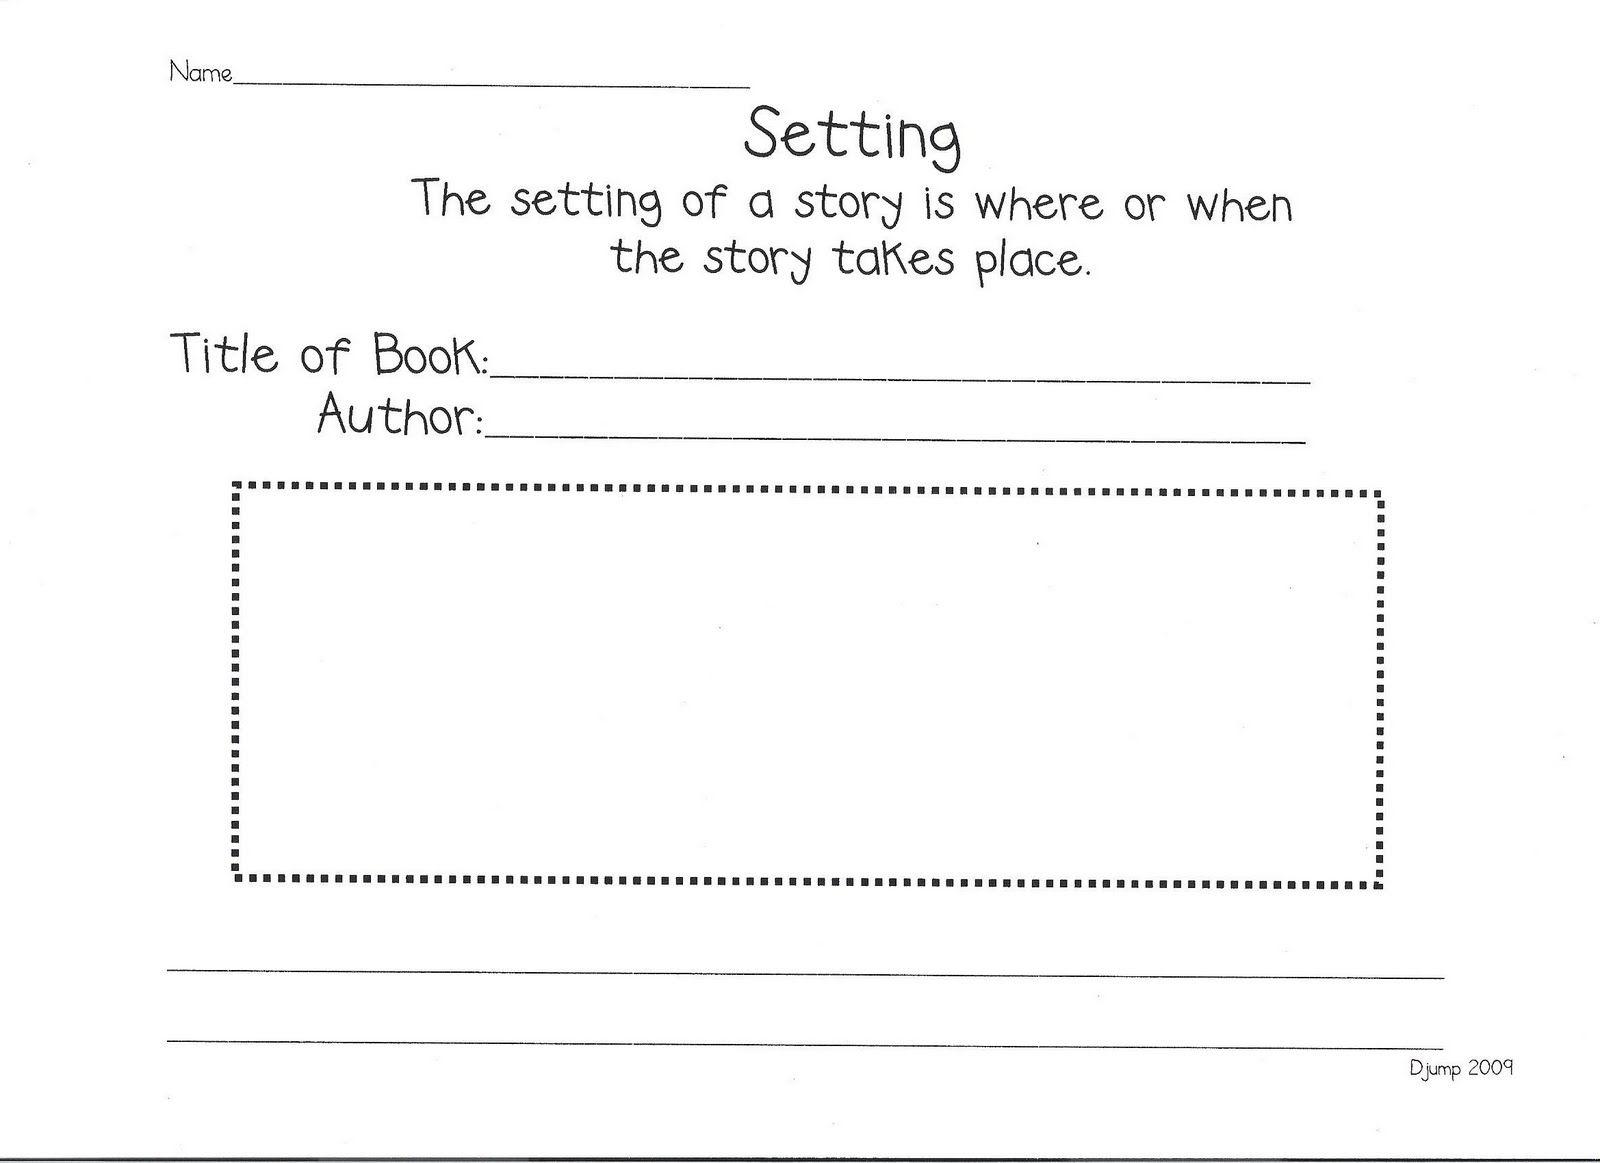 Reading Response Worksheet Focus On Setting